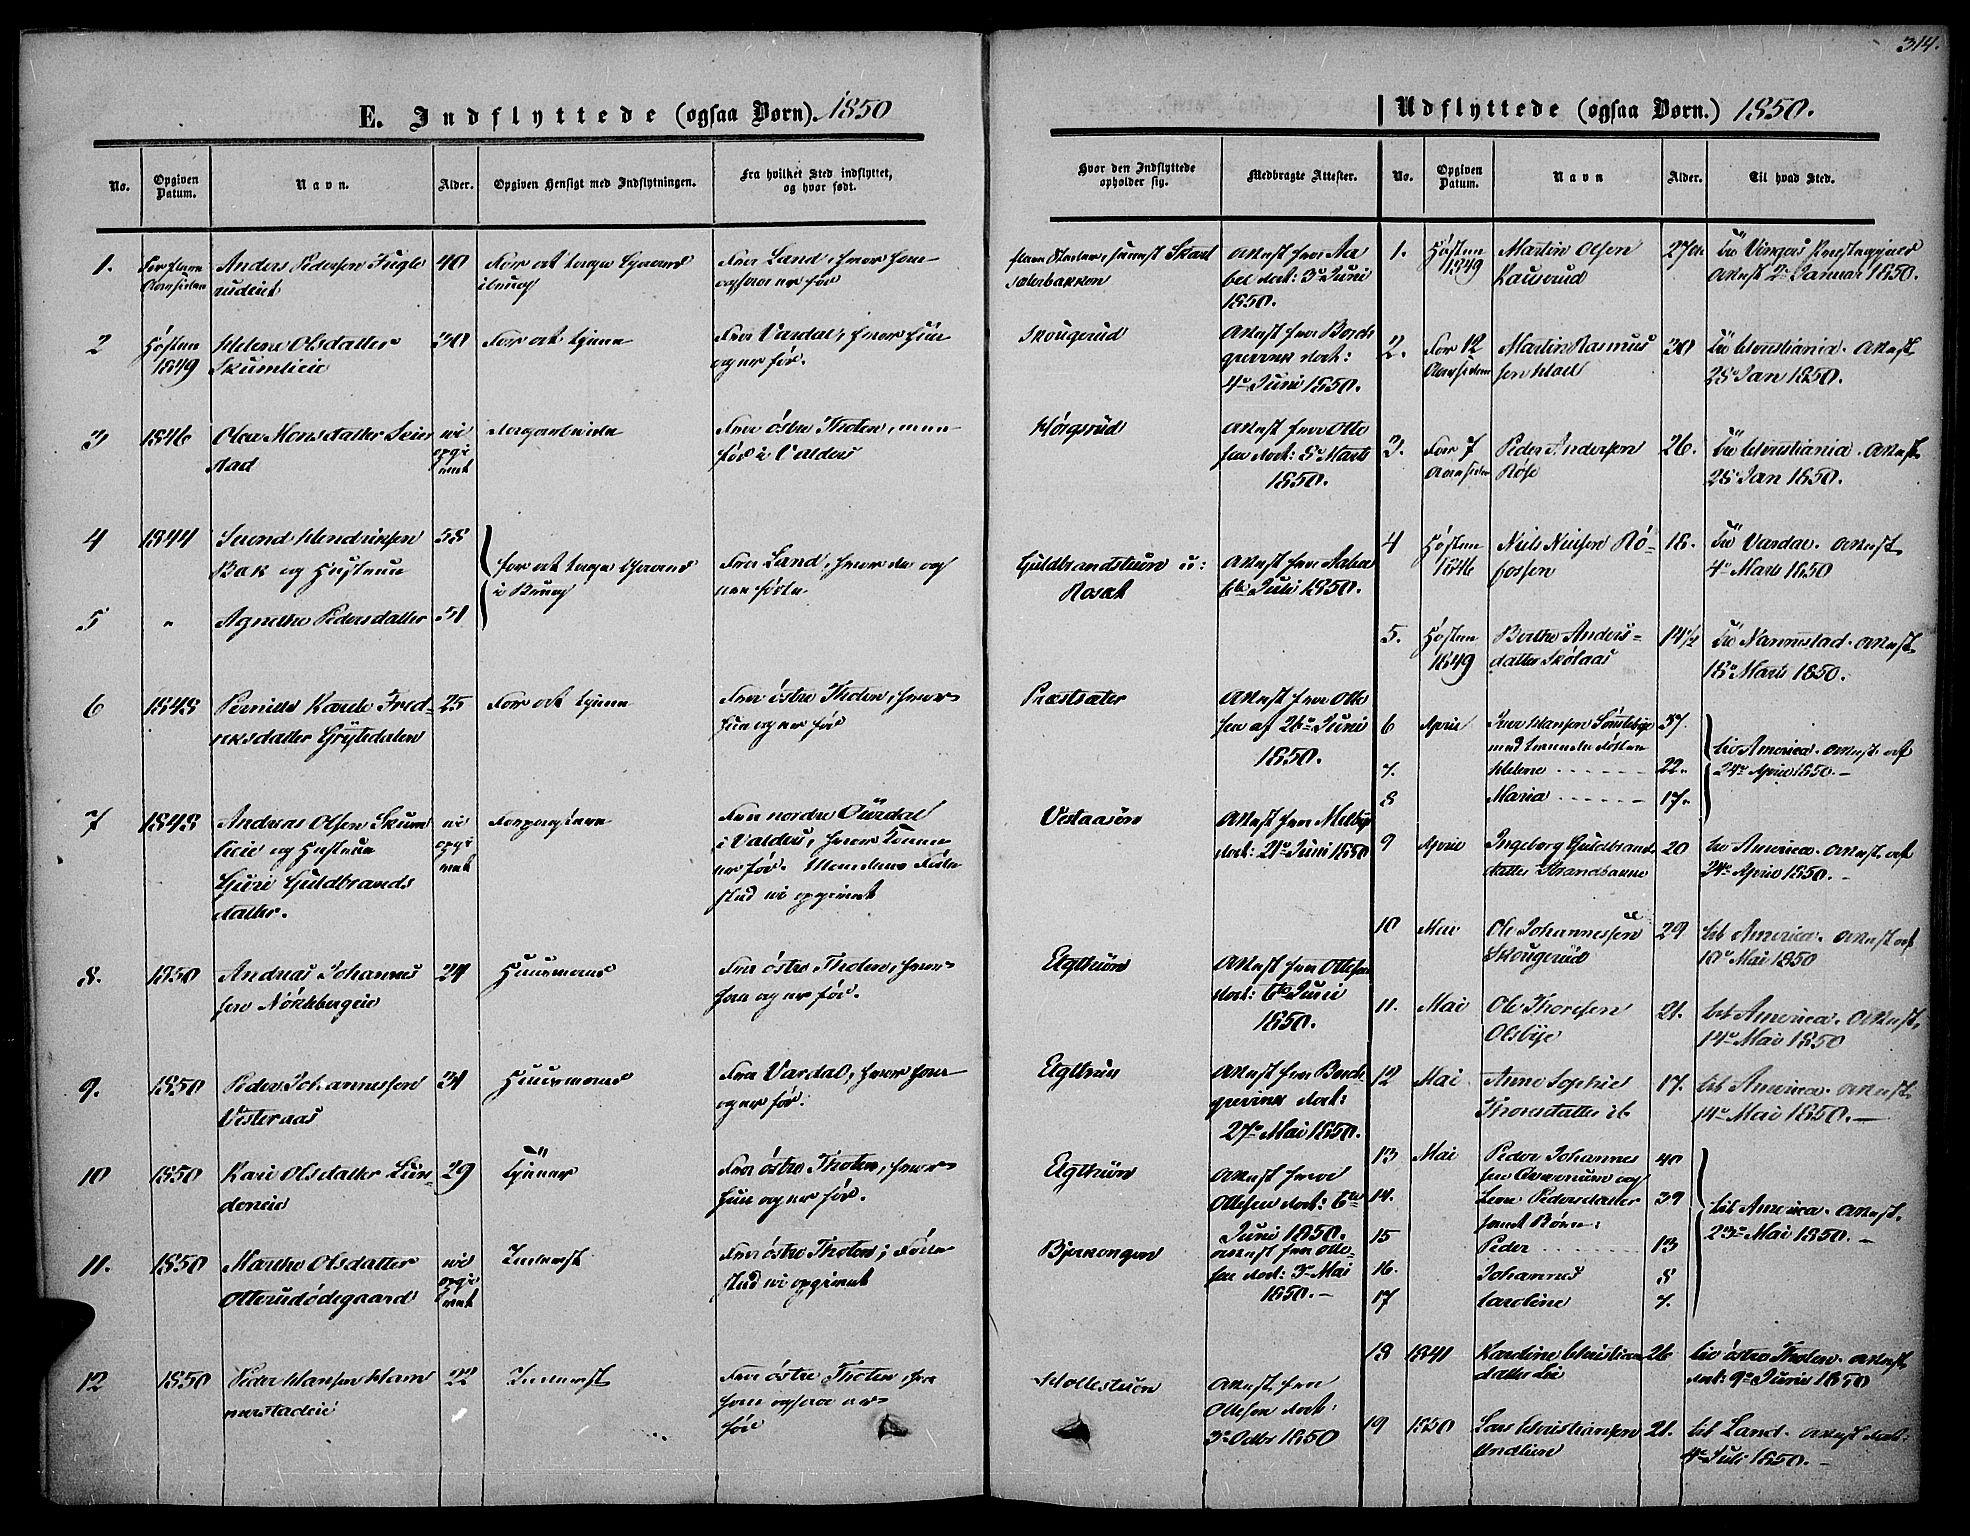 SAH, Vestre Toten prestekontor, H/Ha/Haa/L0005: Ministerialbok nr. 5, 1850-1855, s. 314